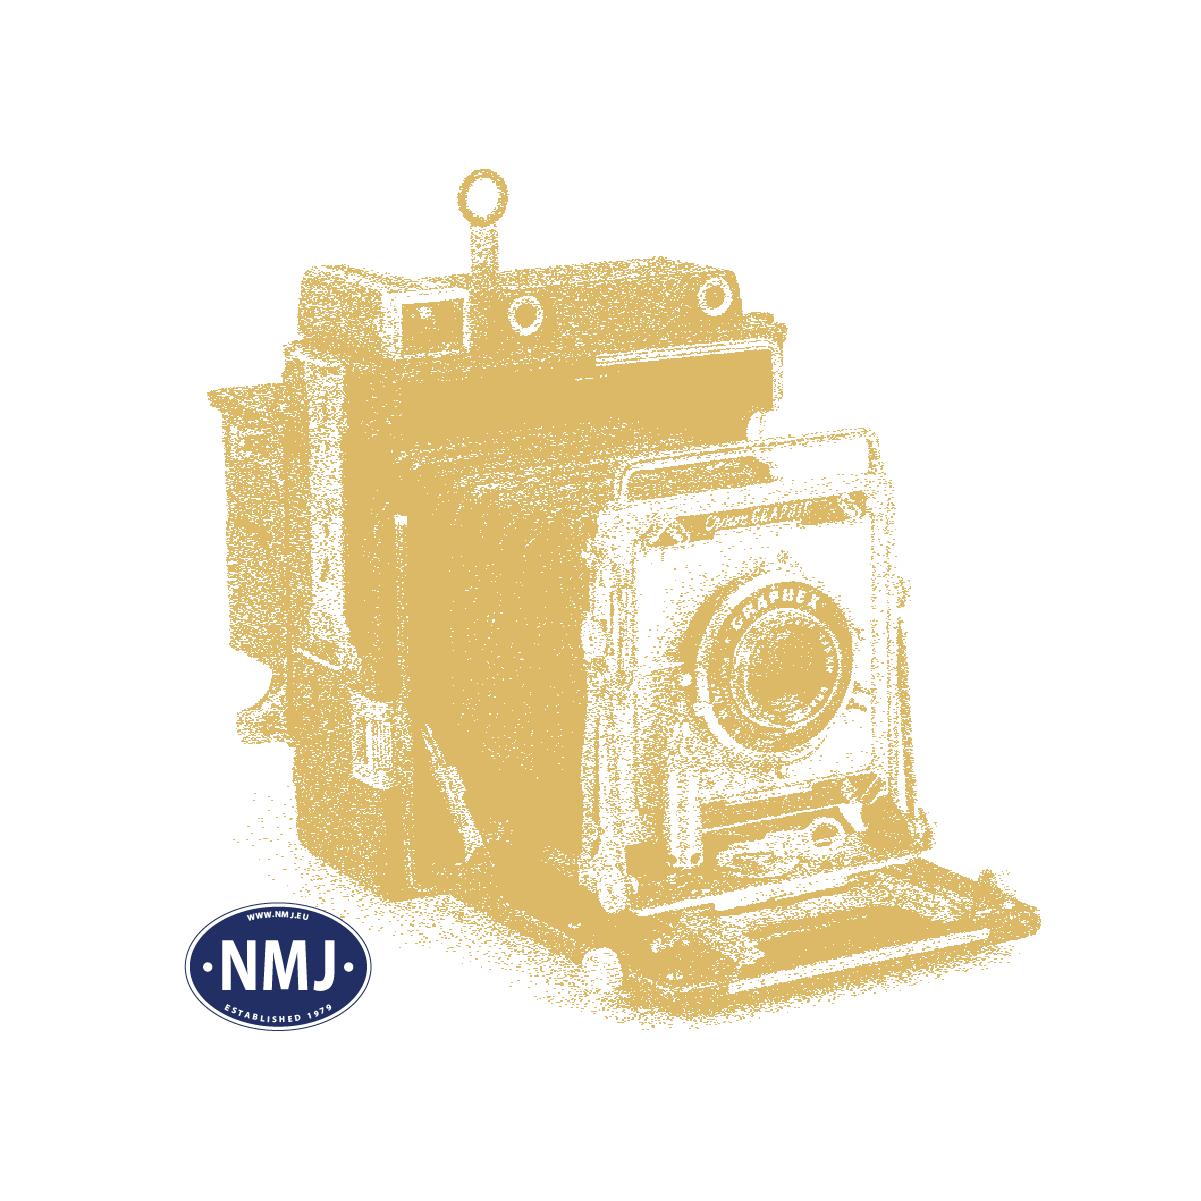 NMJT82.303 - NMJ Topline NSB El13.2139, Rød/Sølv, DC